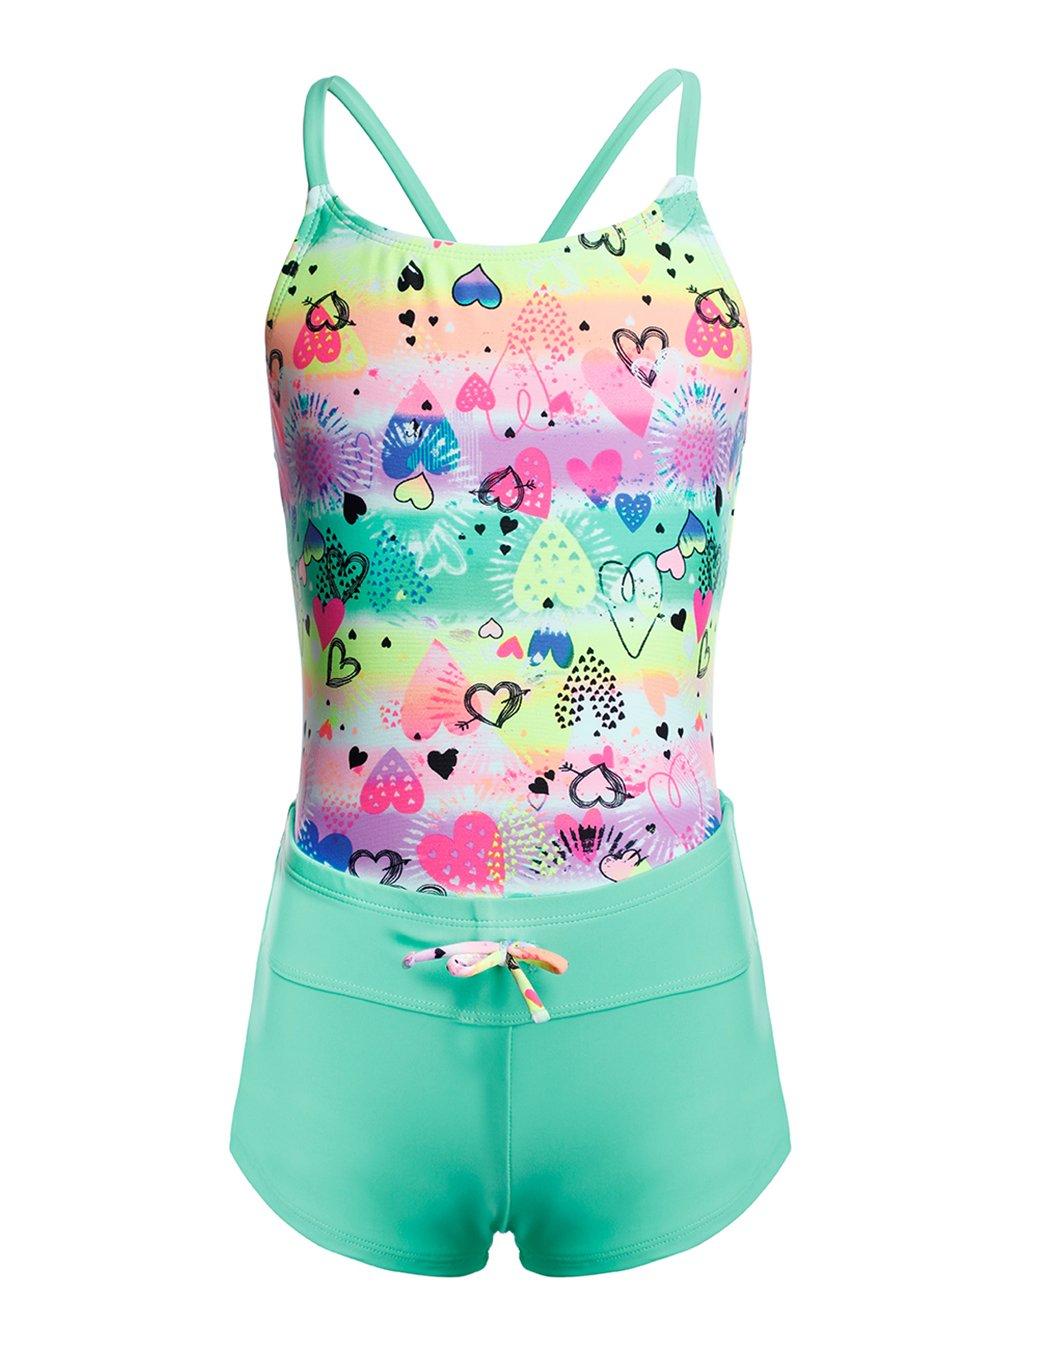 Girls Tankini Bathing Suit, Criss Cross Swimwear with Solid Colored Boyshorts for Girls Beach Sports